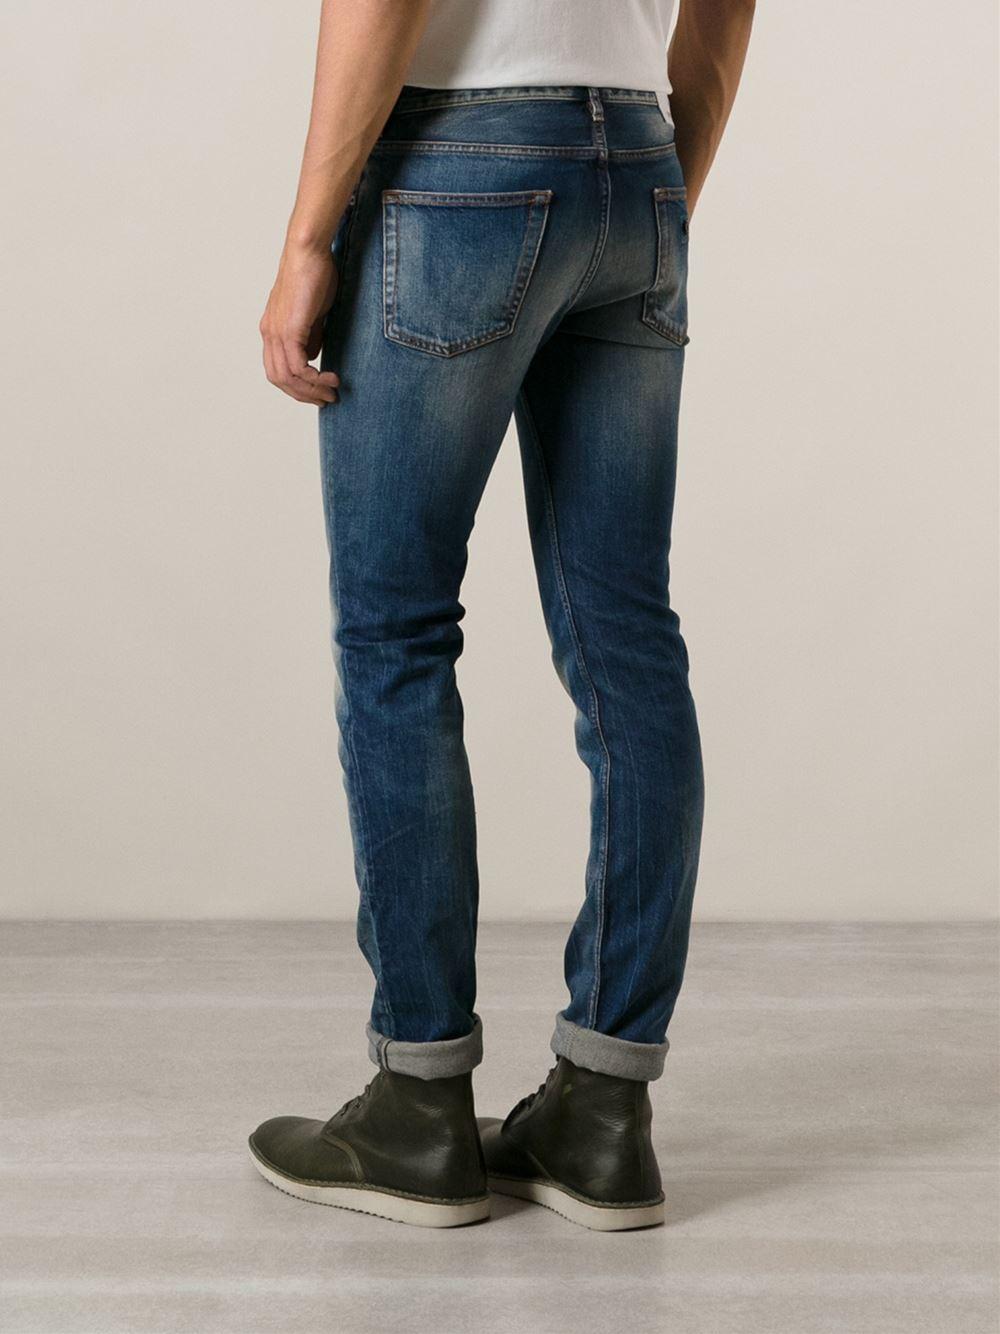 stone island skinny jeans in blue for men lyst. Black Bedroom Furniture Sets. Home Design Ideas